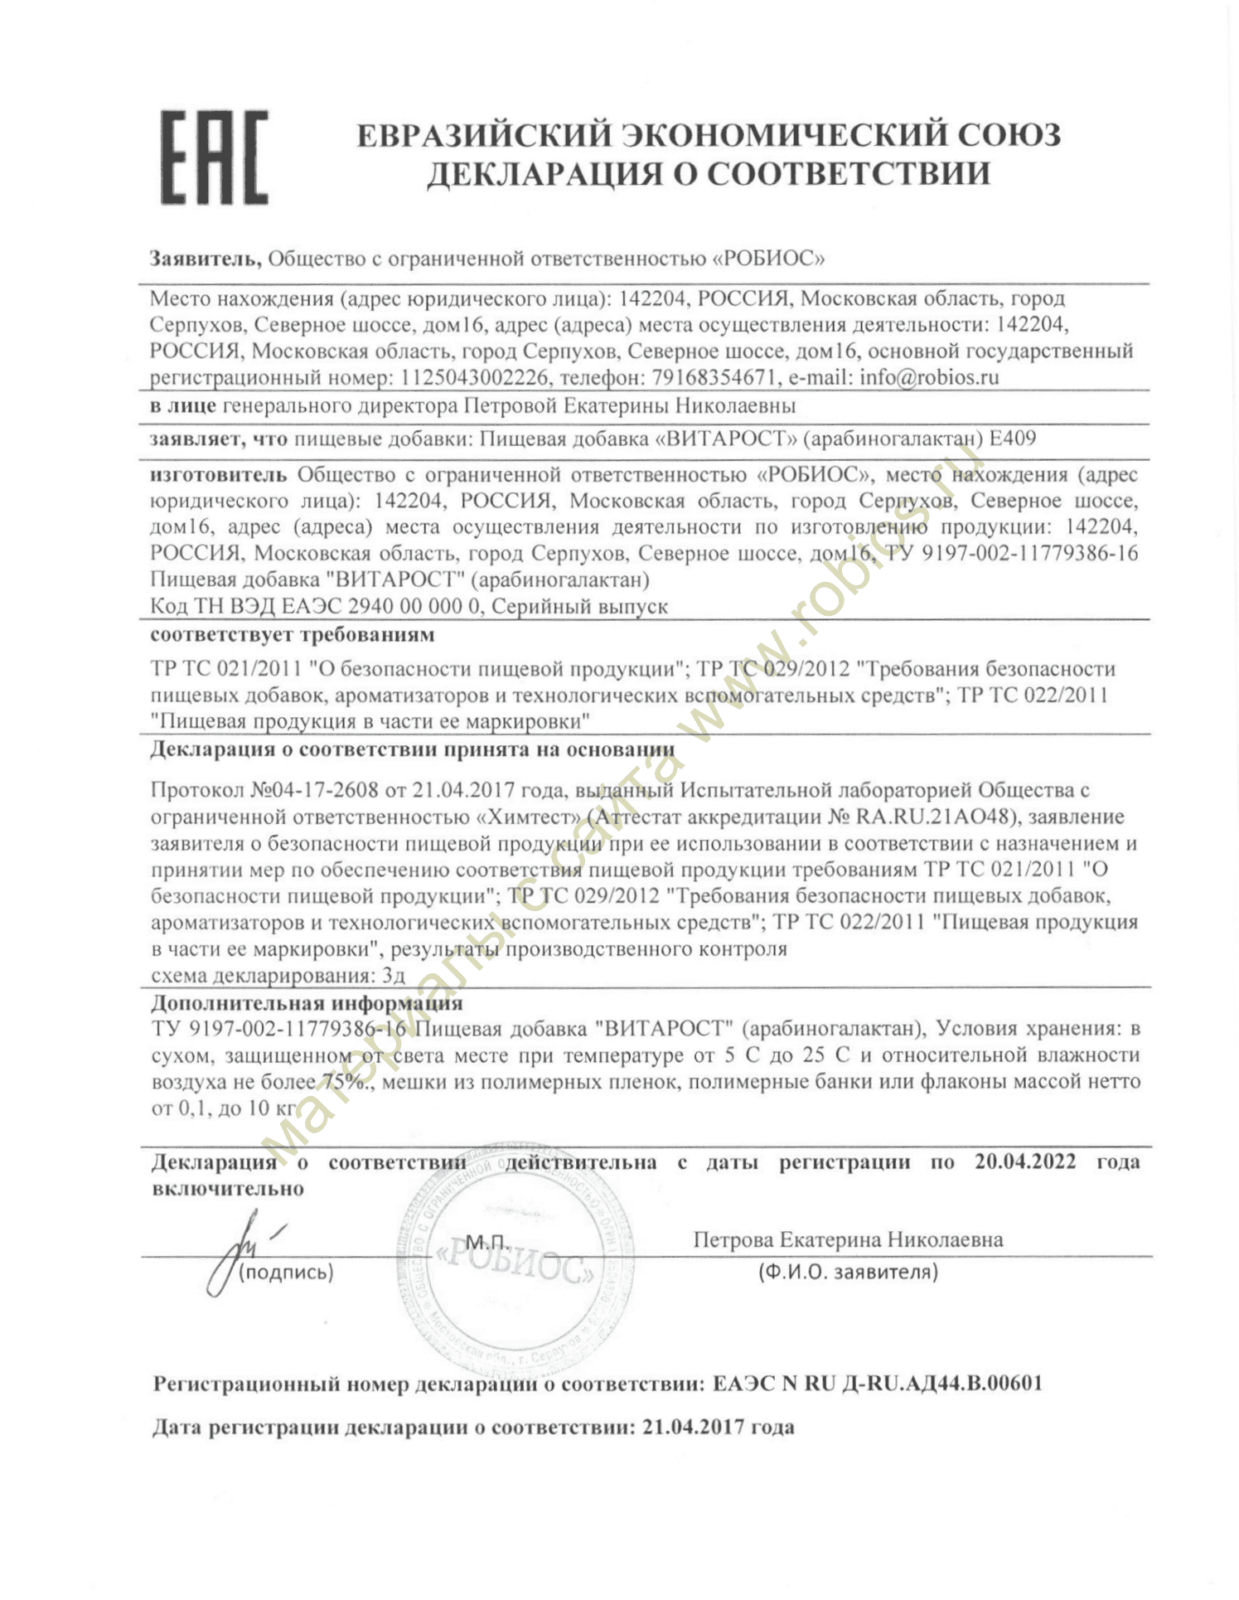 declaration_AG_robios